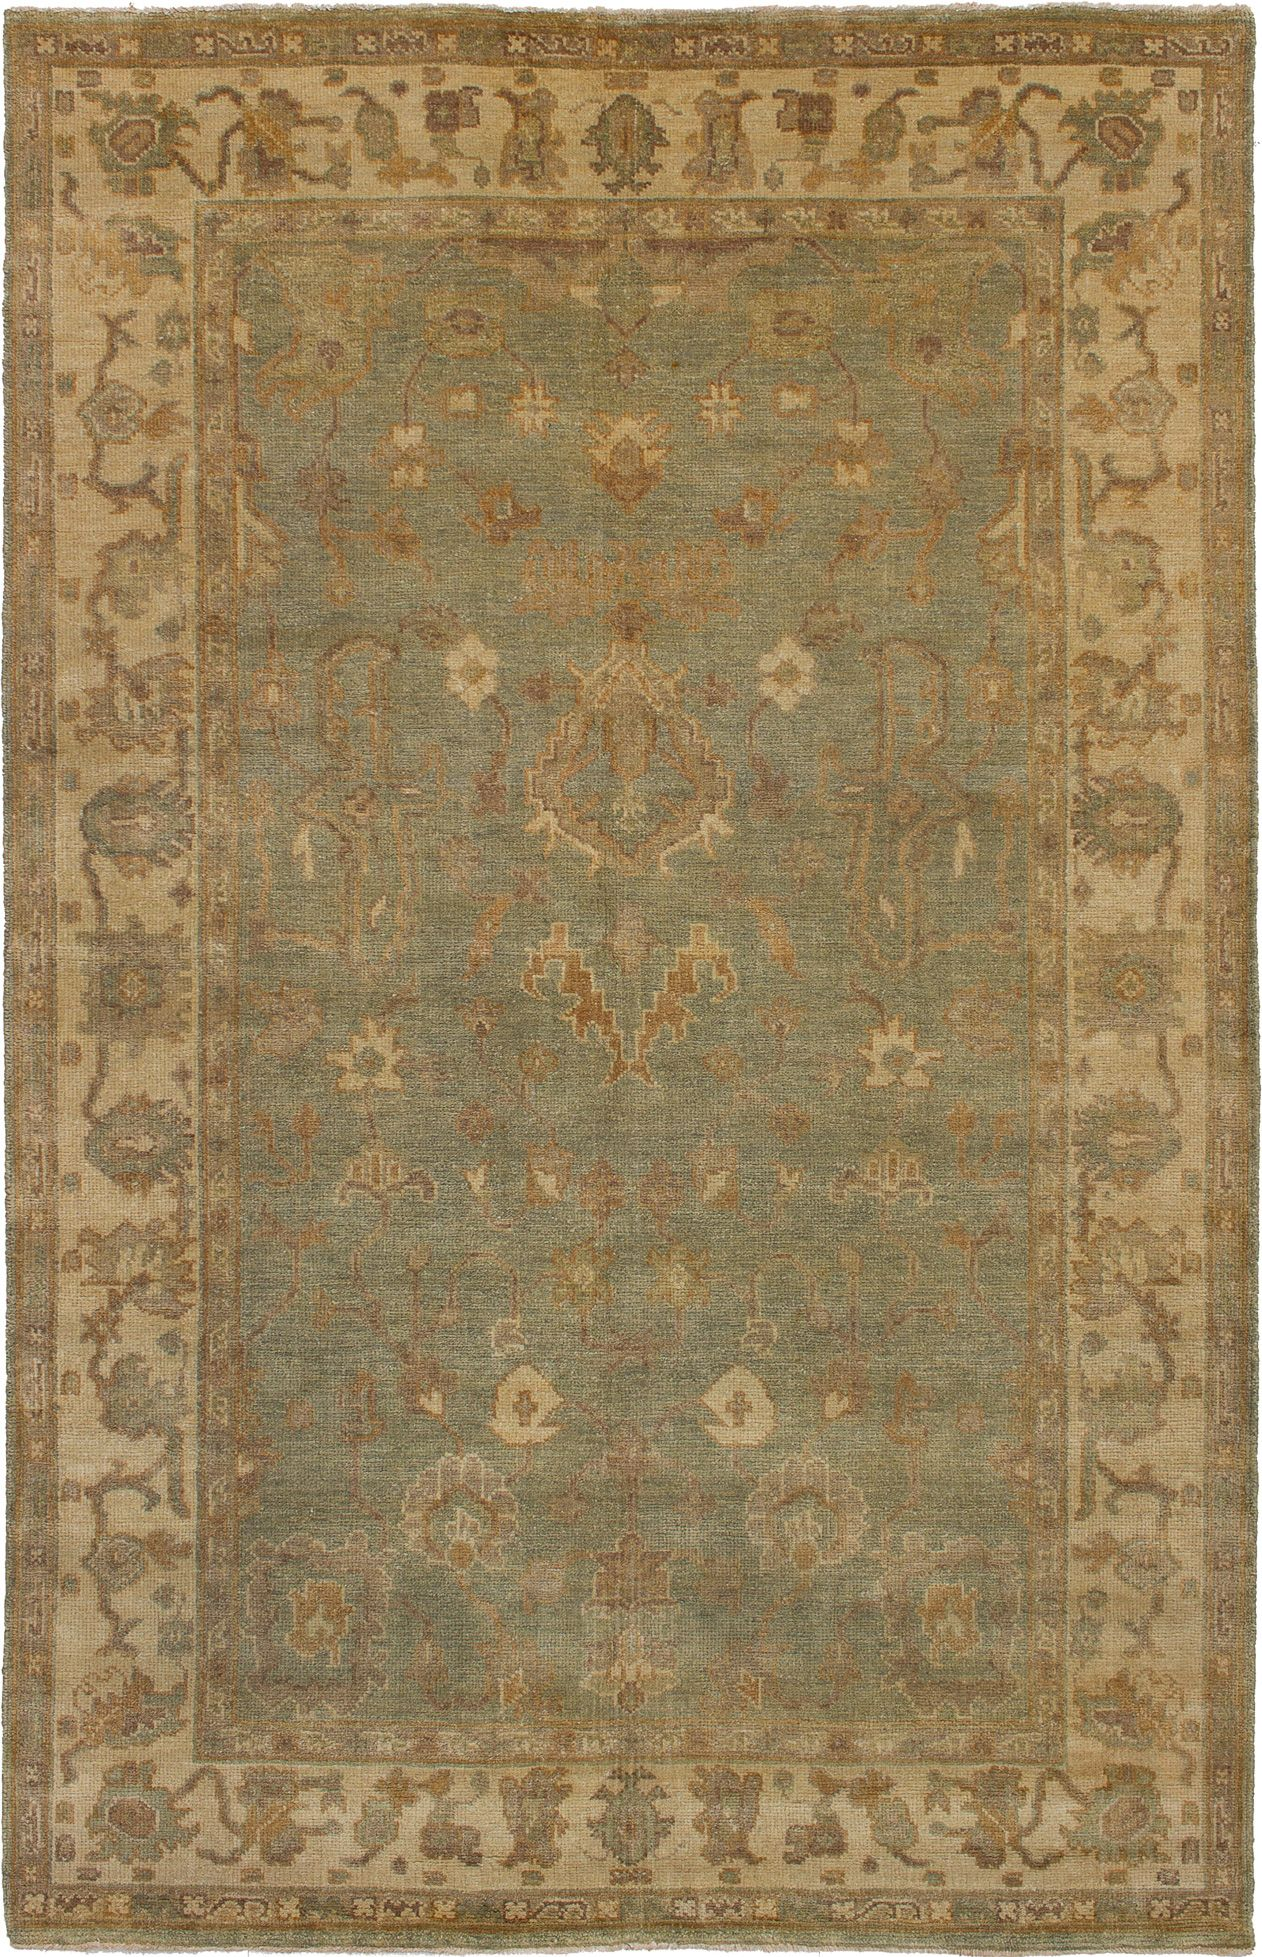 "Hand-knotted Royal Ushak Grey Wool Rug 5'6"" x 8'8"" Size: 5'6"" x 8'8"""